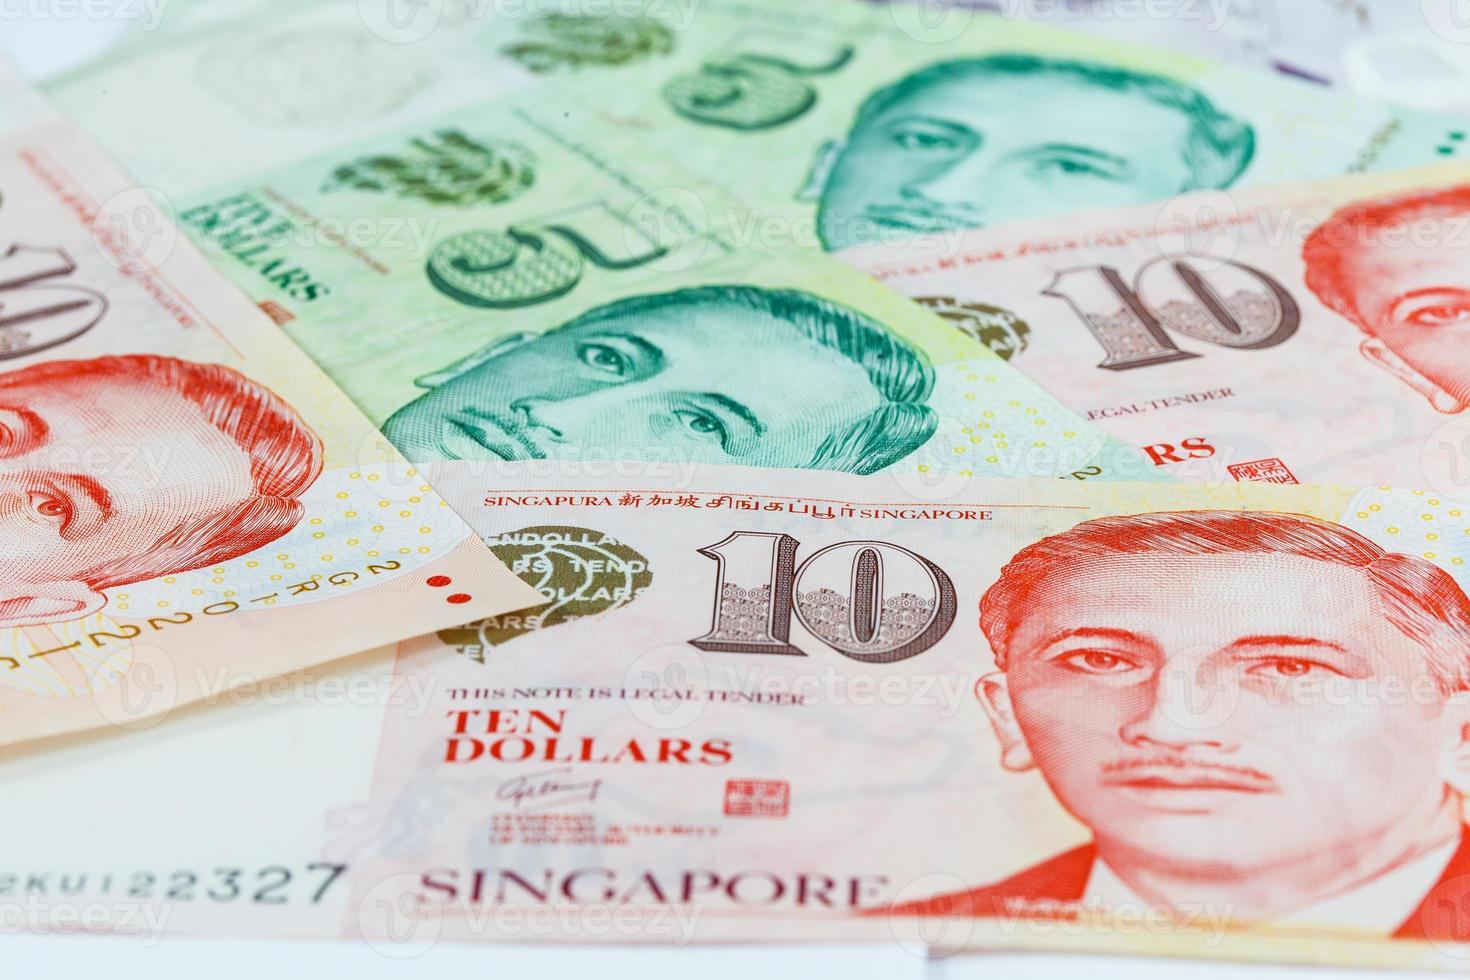 nota dei dollari di Singapore foto